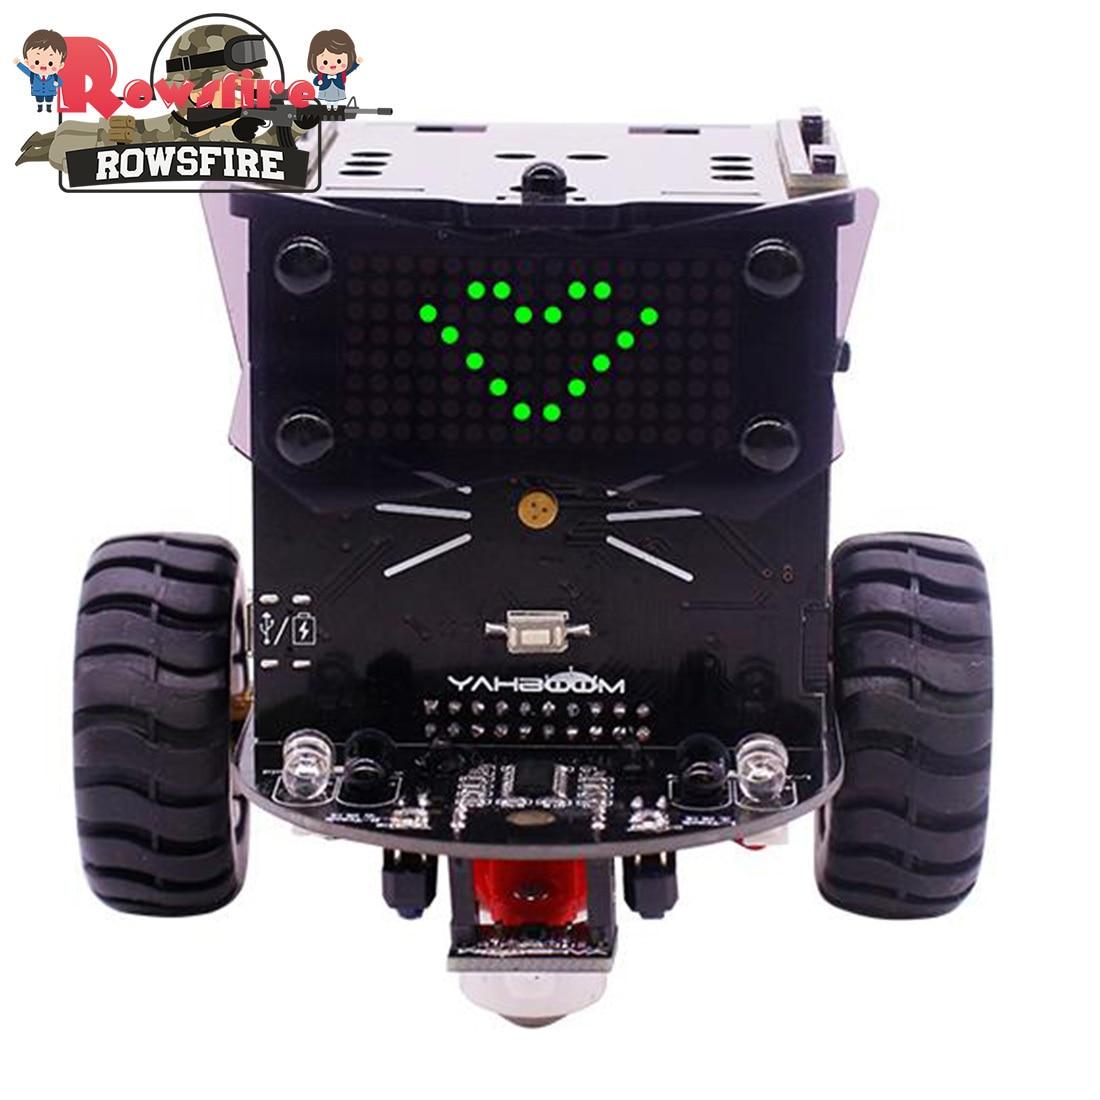 2019 New Hot 1 Set Standard Version Omibox Scratch Programmable Robot Car Kit